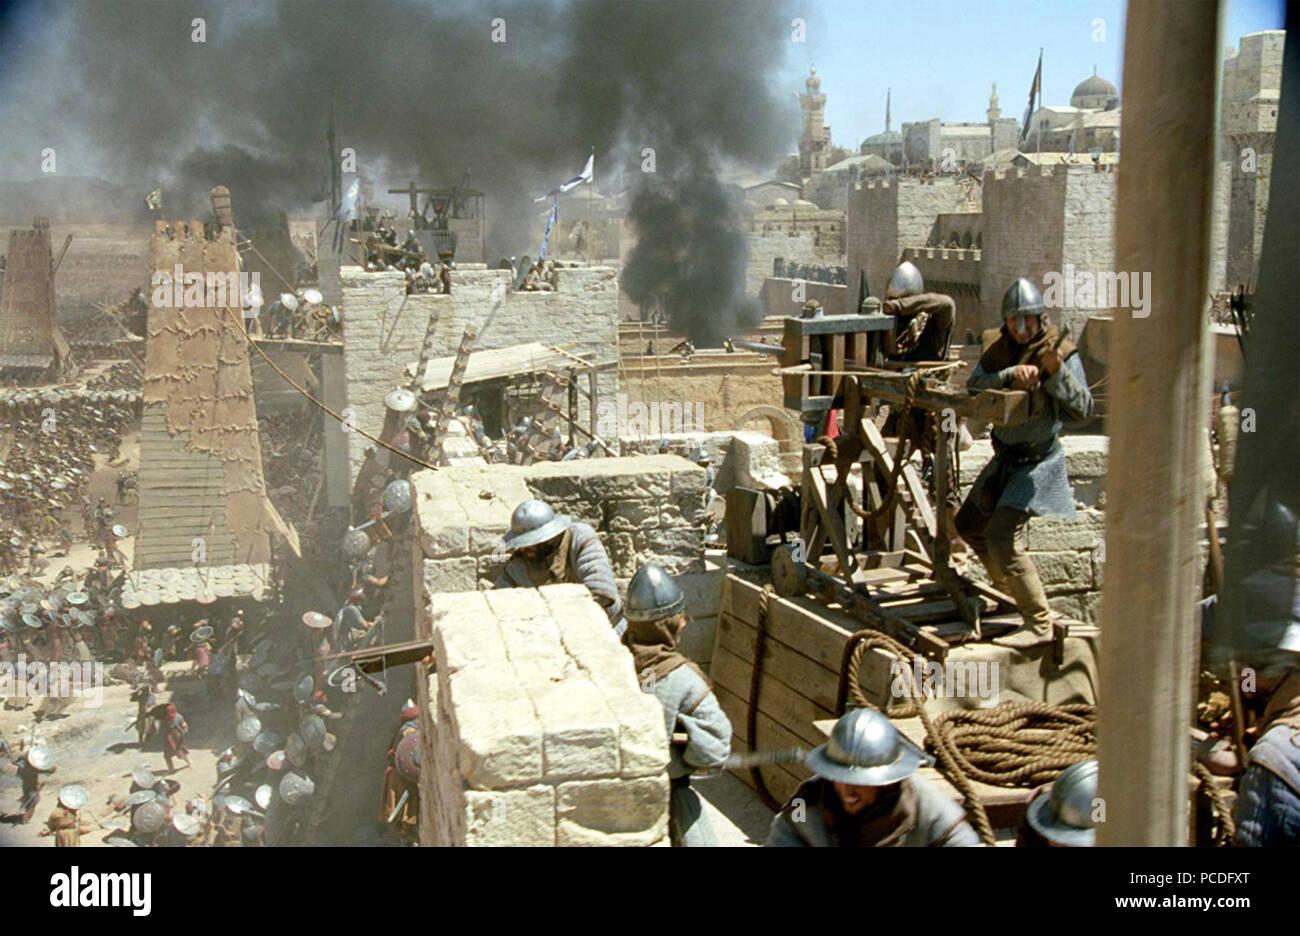 Royaume des Cieux 2005 20th Century Fox Film Photo Stock